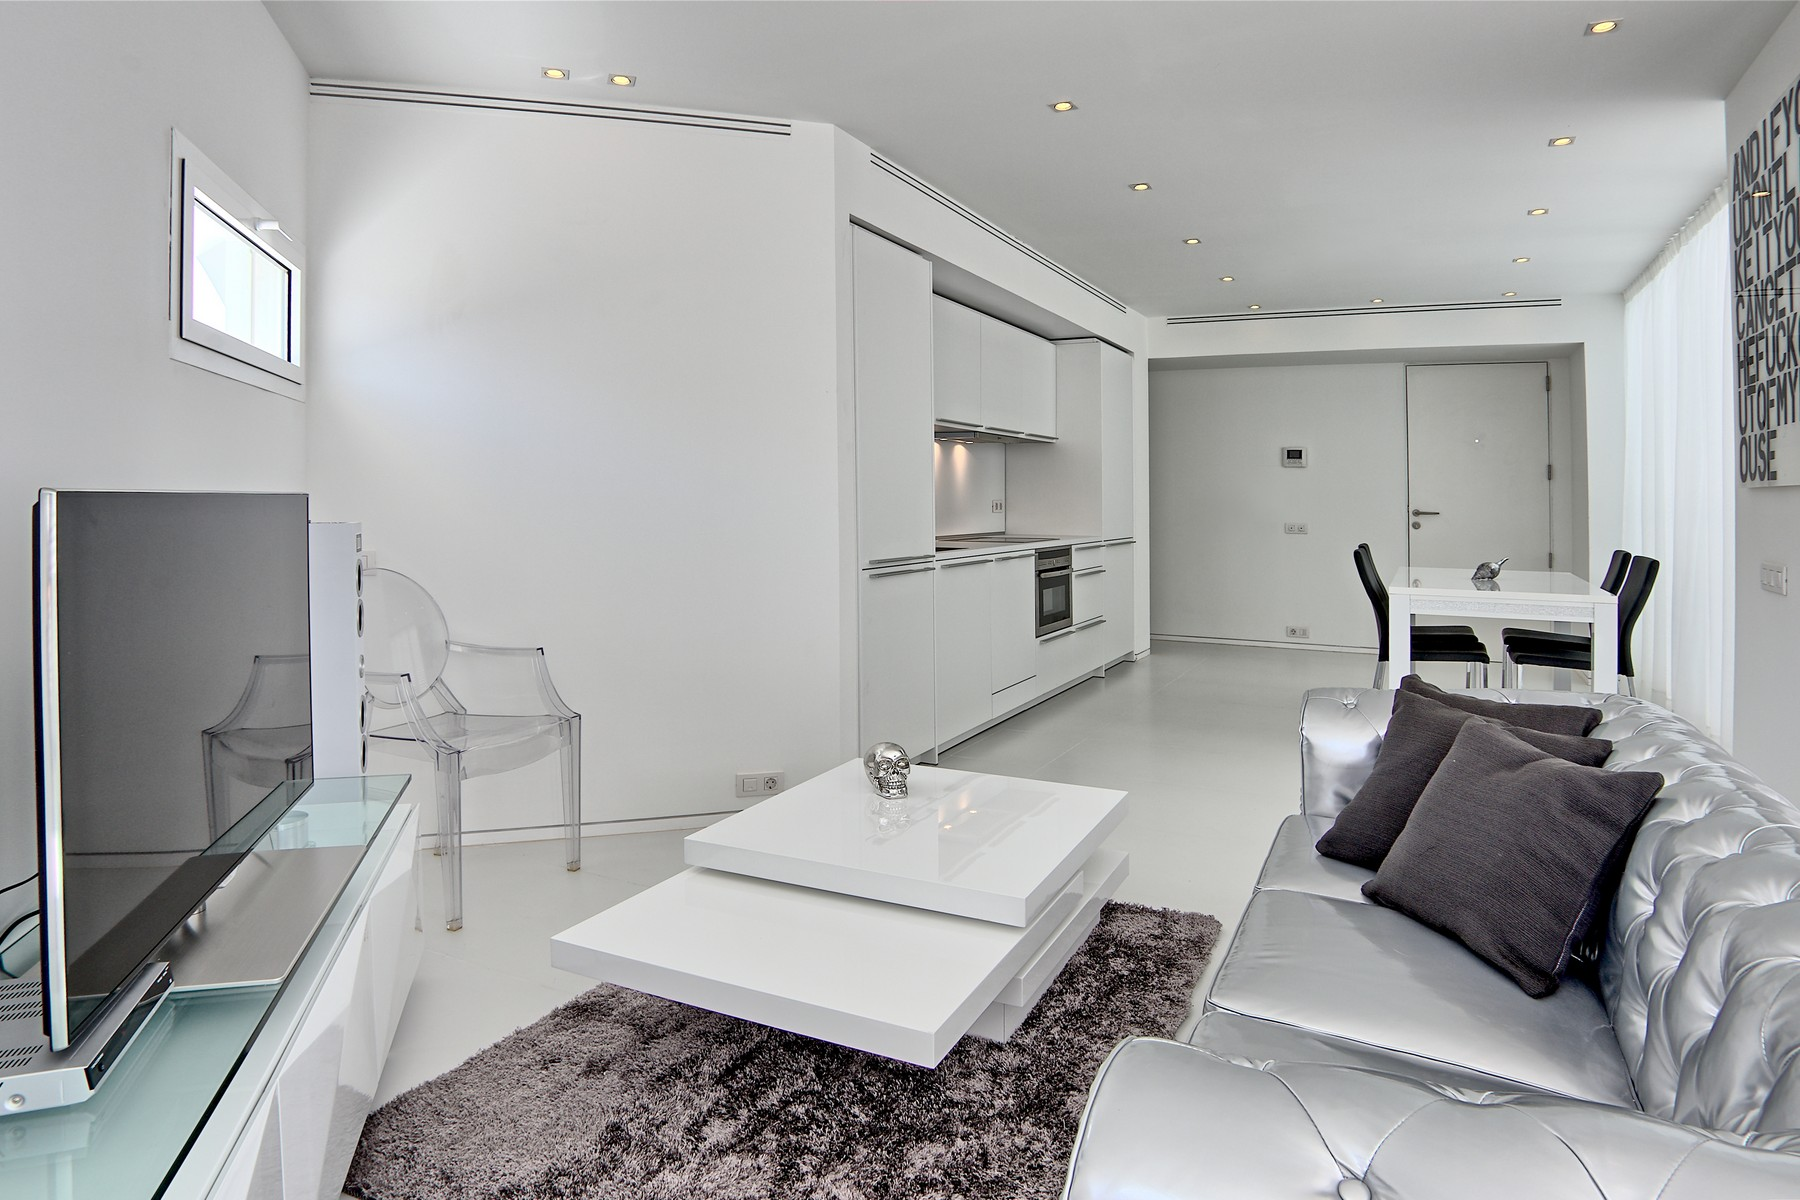 Apartment for Sale at Modern spacious 1 bed apartment in Marina Botafoch Ibiza, Ibiza, 07800 Spain